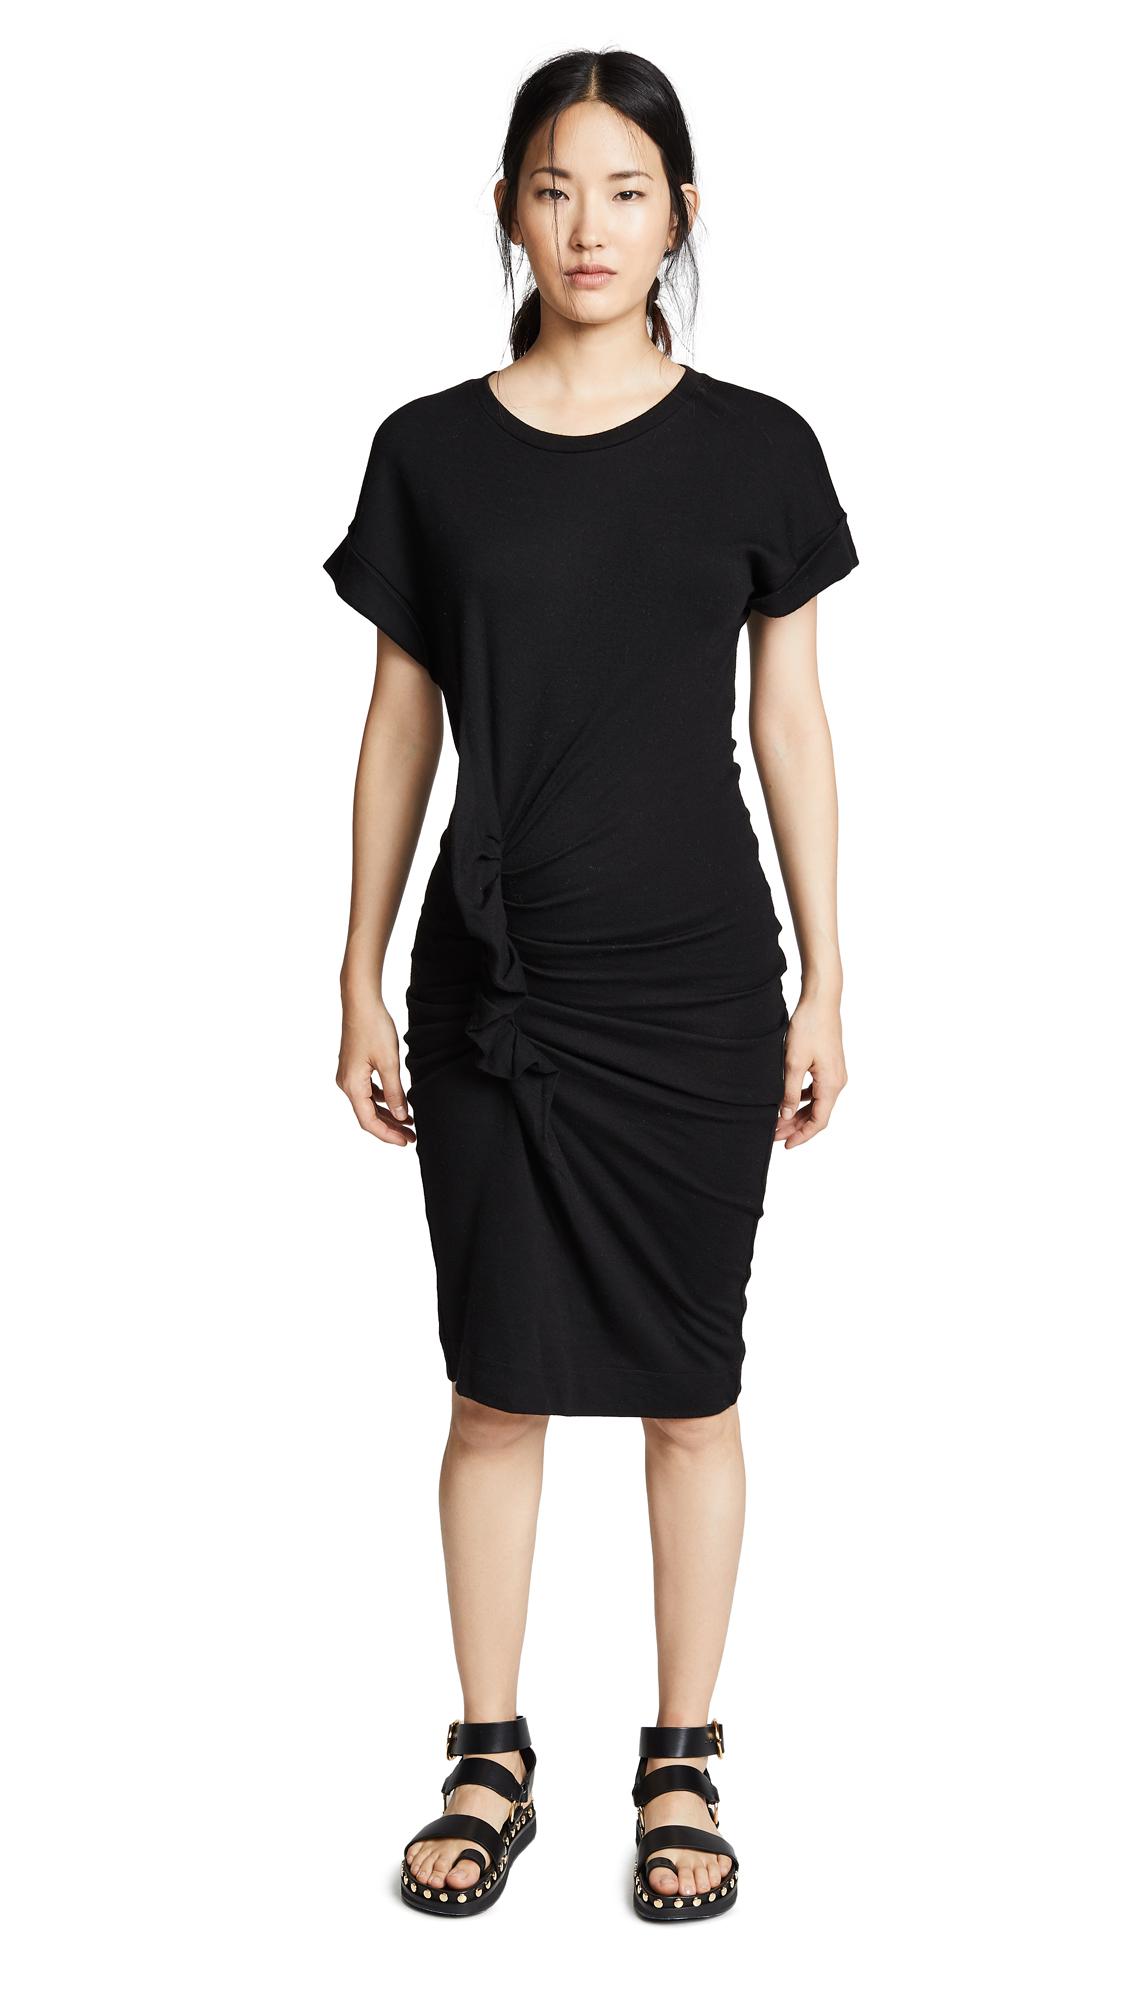 Isabel Marant Etoile Jisa Dress In Black